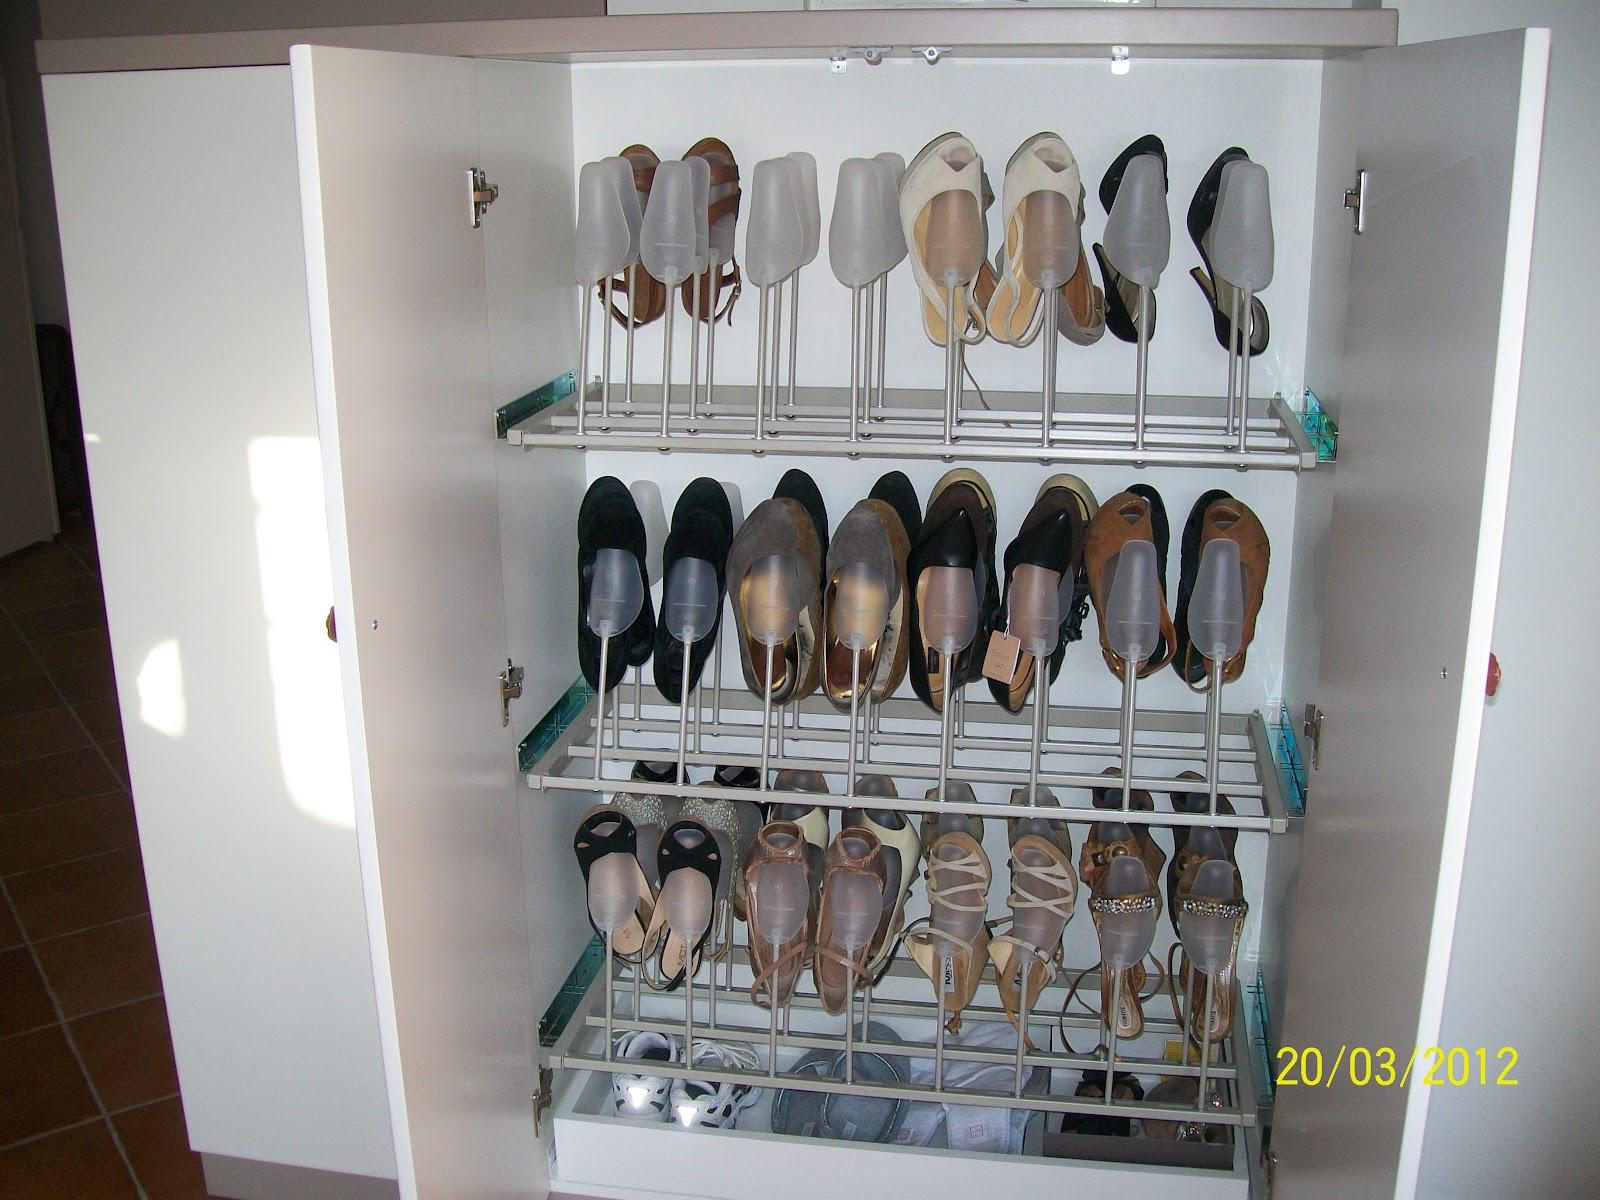 Cabina Armadio Rotante : Cabina armadio con scarpiera rotante: scarpiera cabina armadio